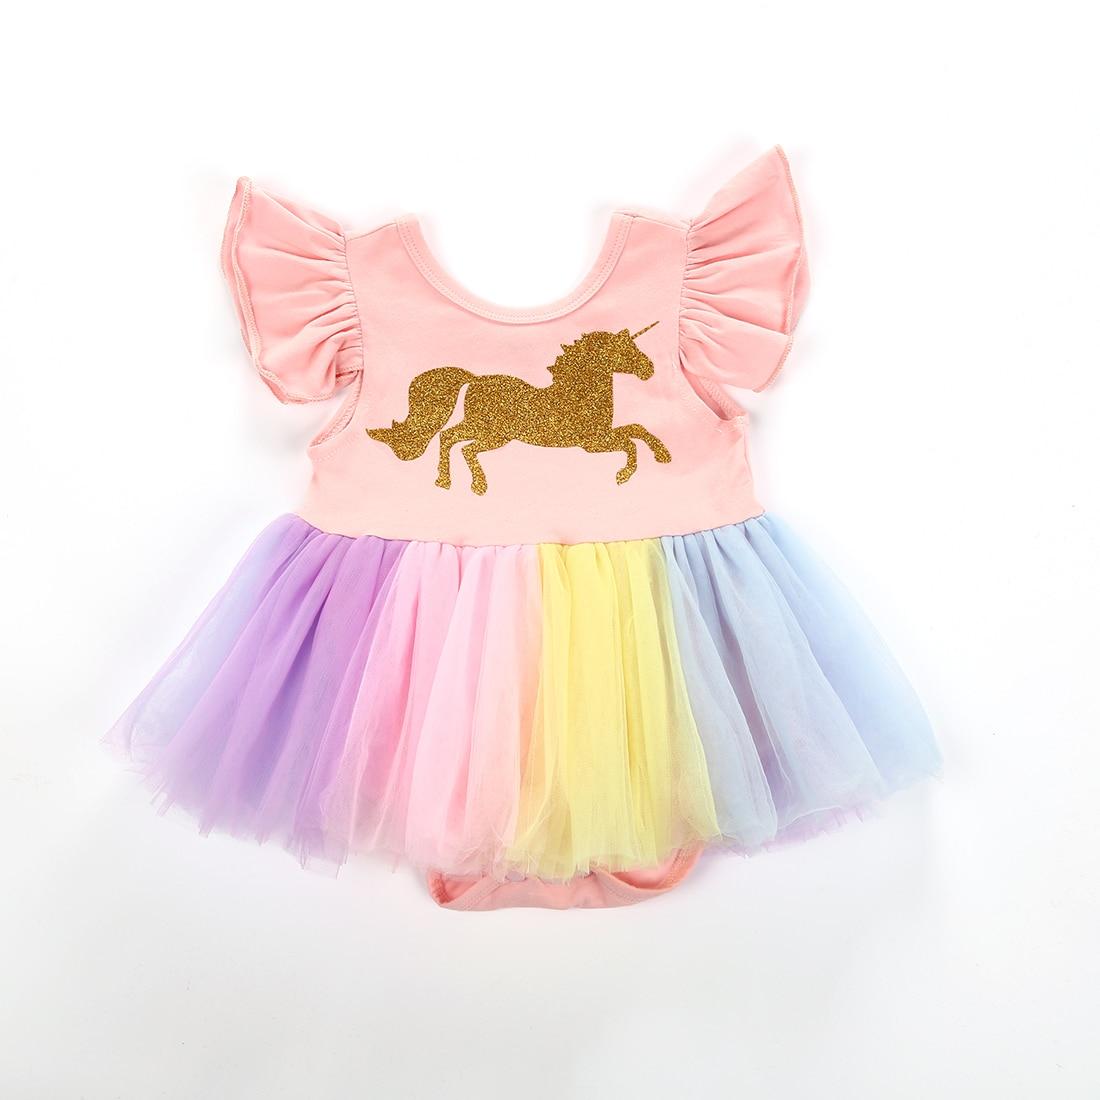 Bonito vestido de unicornio para niña recién nacida volantes sin mangas tutú de dibujos animados Mini vestidos de ropa de verano 0-24M